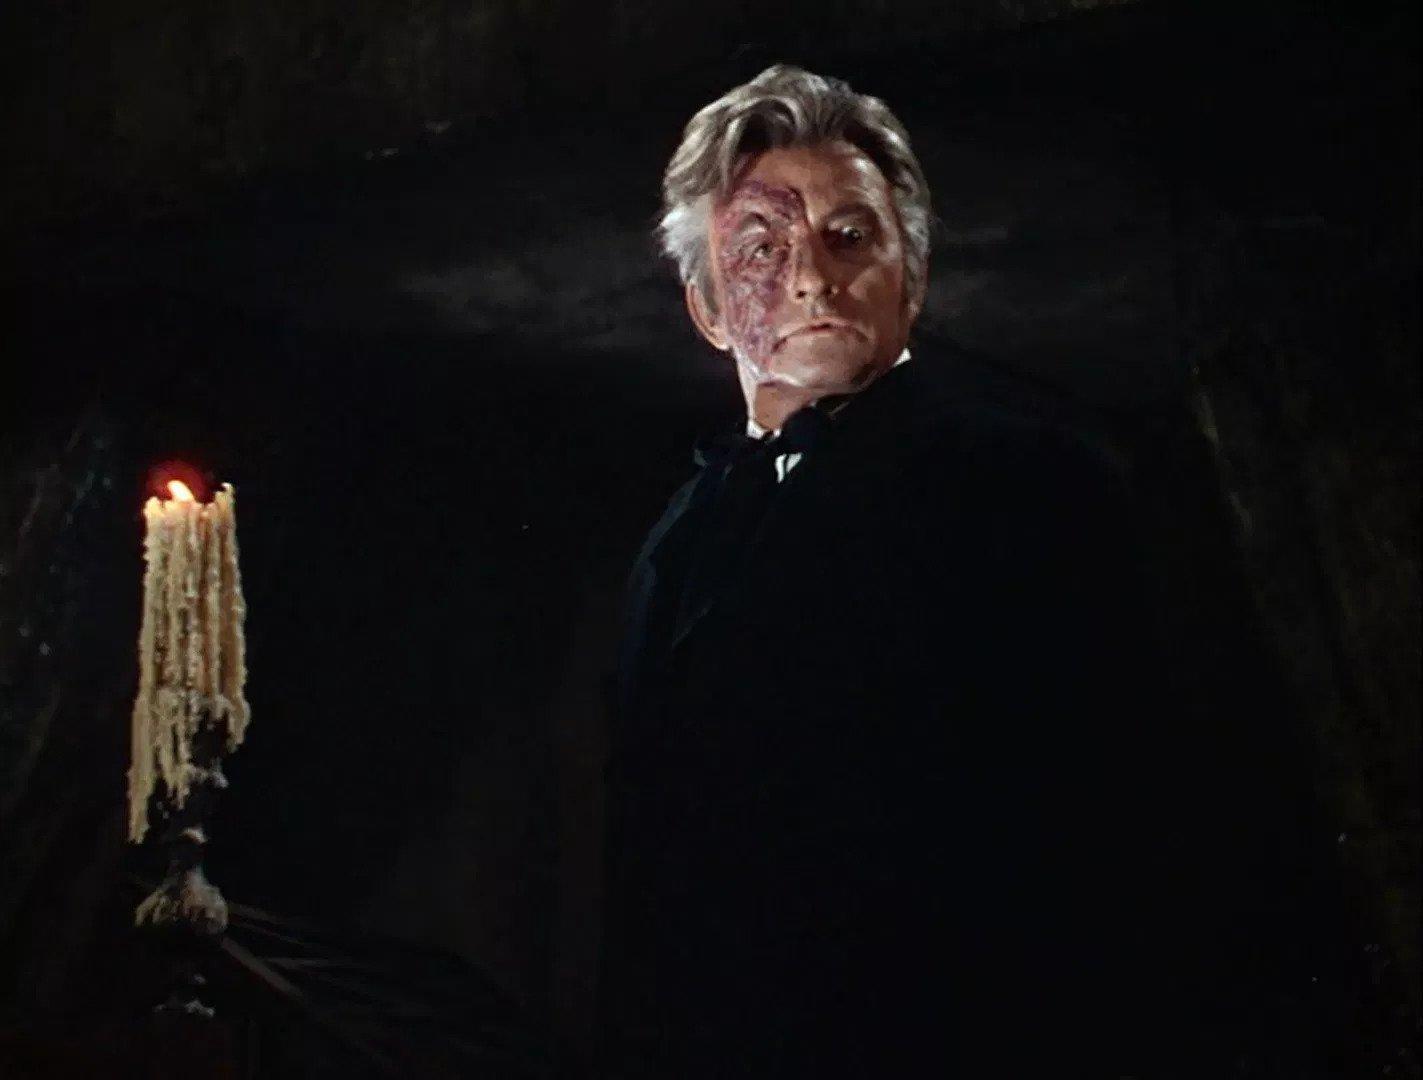 Claude Rains as The Phantom, Enrique Claudin in Phantom of the Opera (1943)